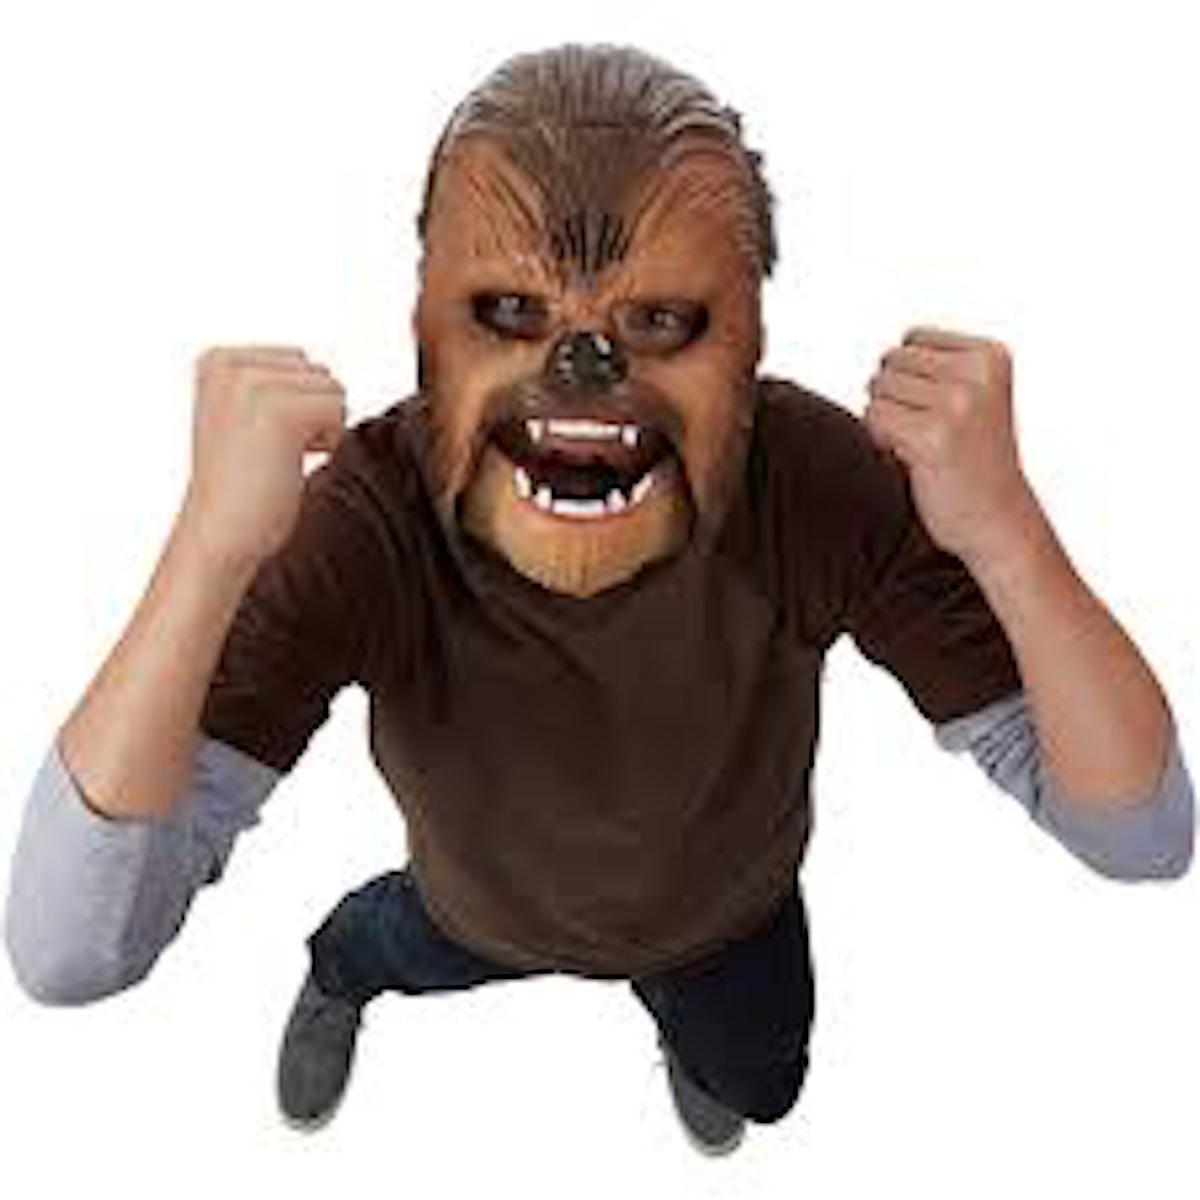 Star Wars The Force Awakens Chewbacca Mask